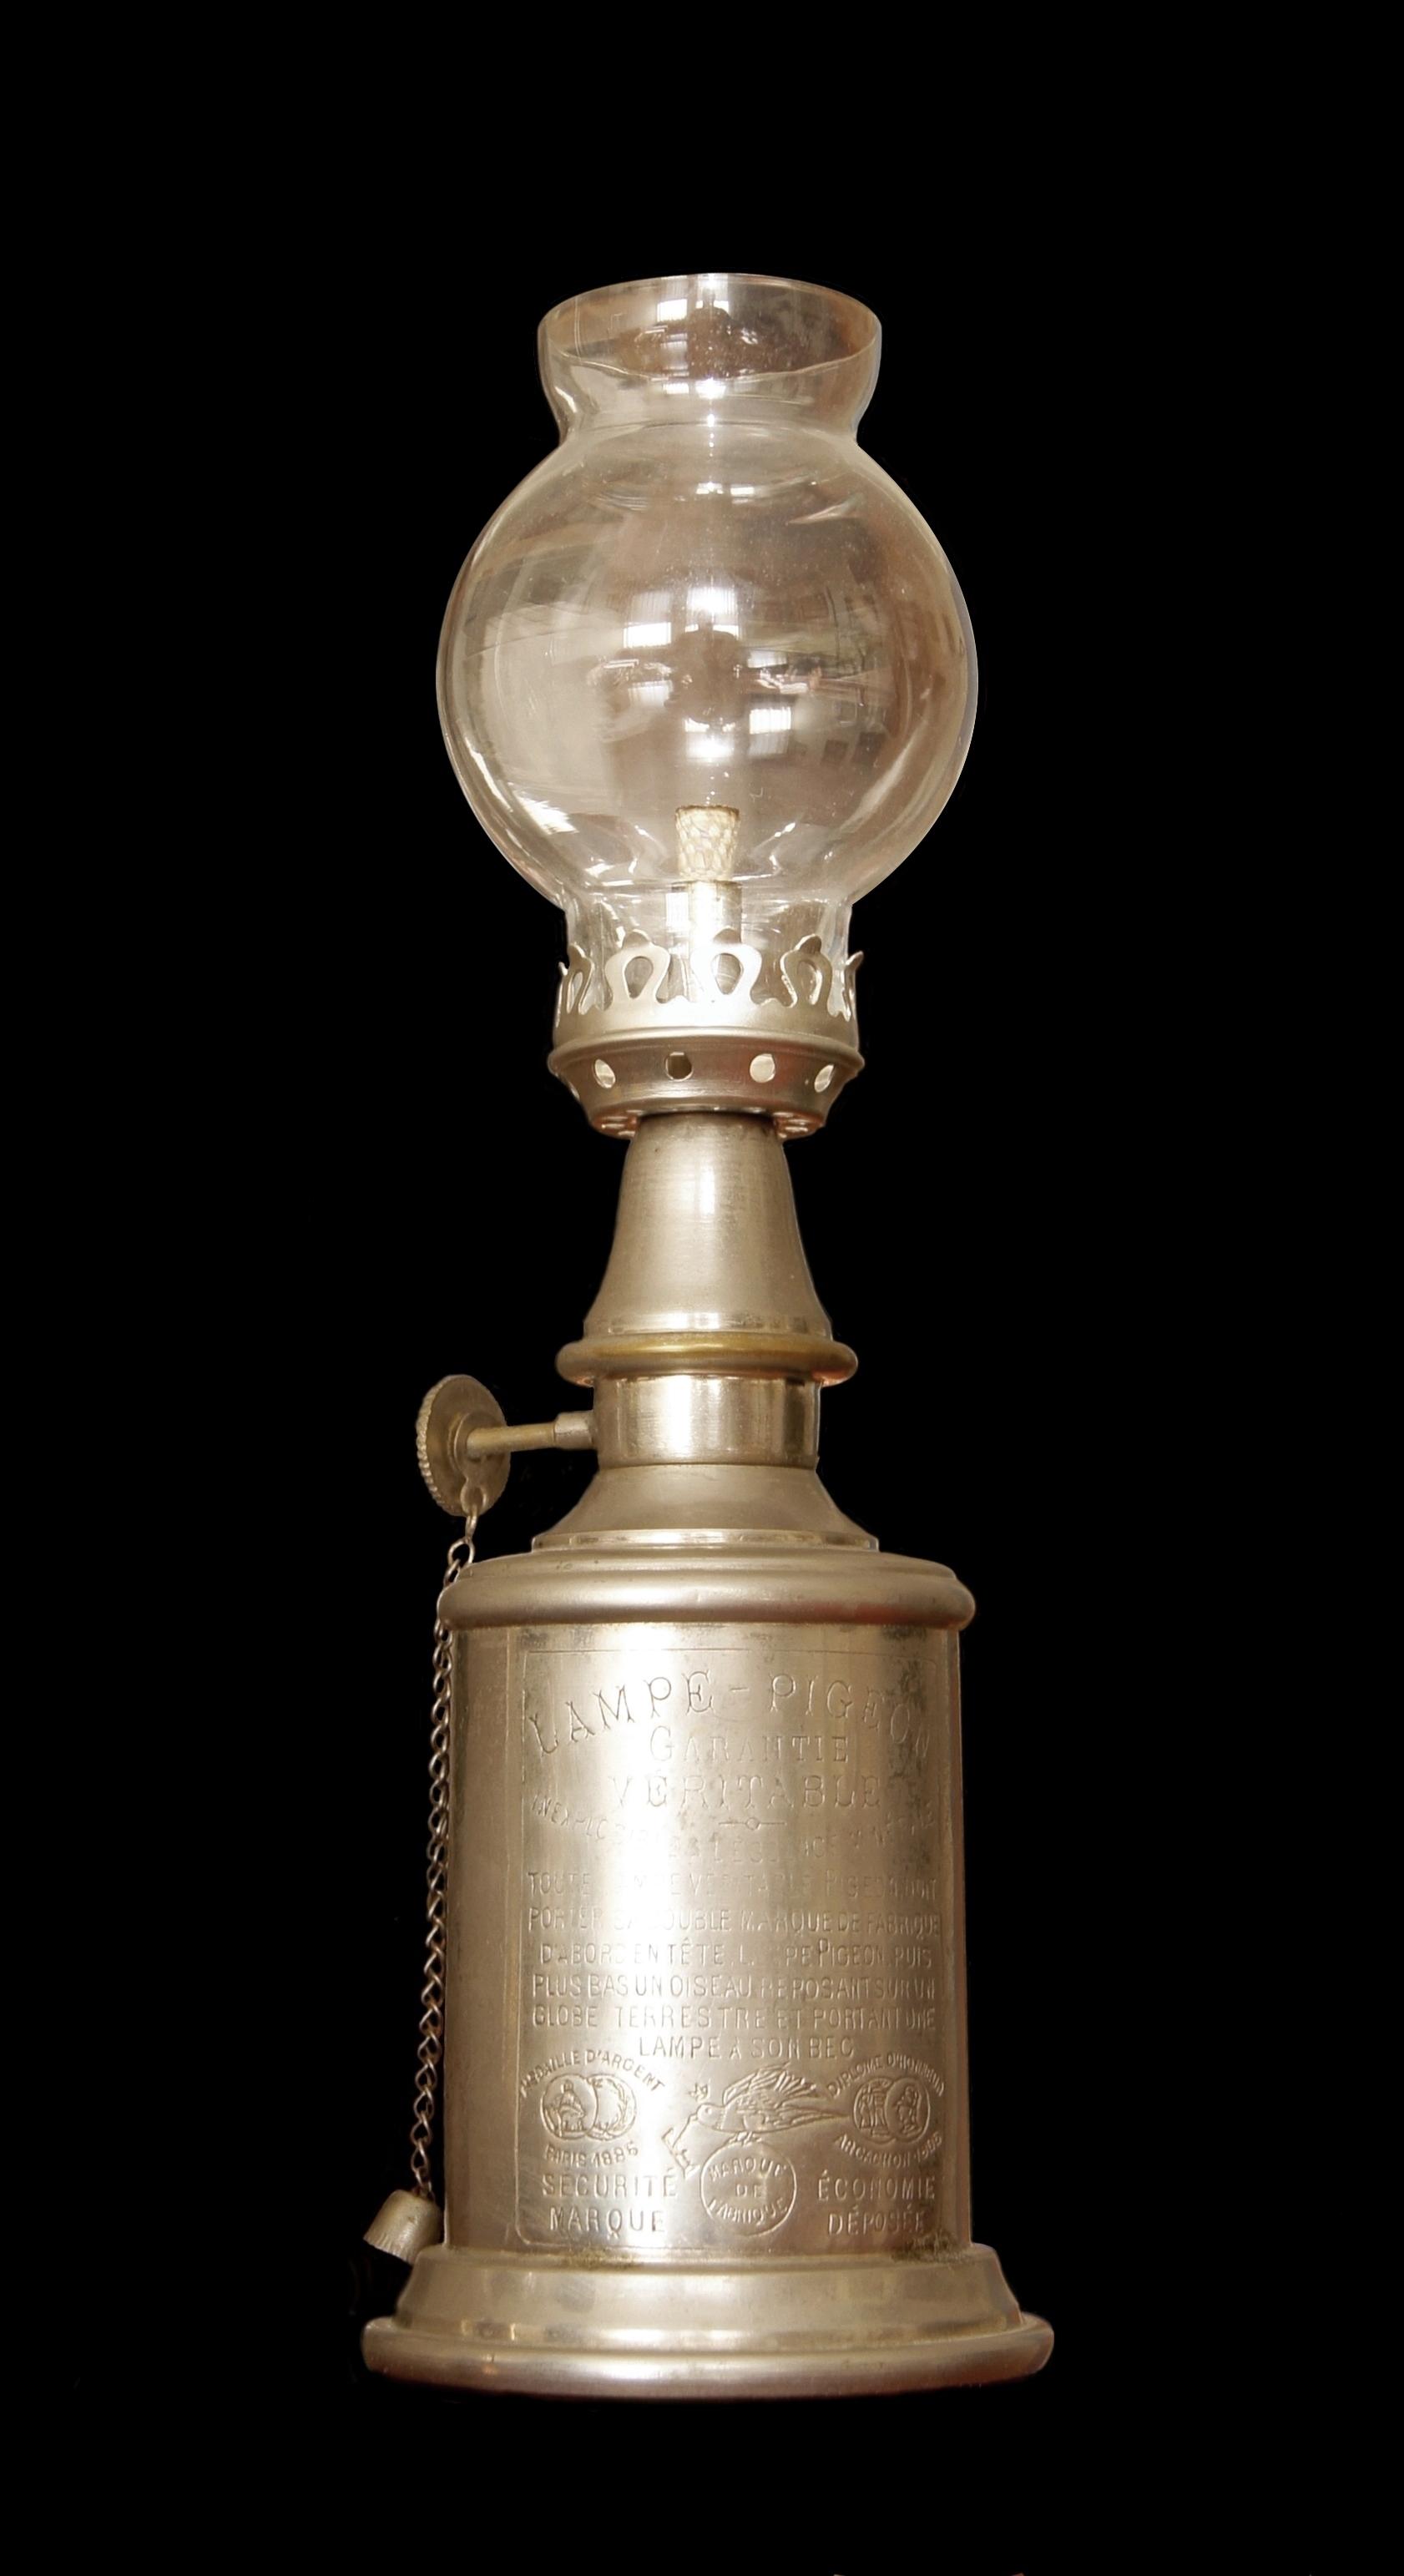 File Lampe Pigeon 1 Jpg Wikimedia Commons